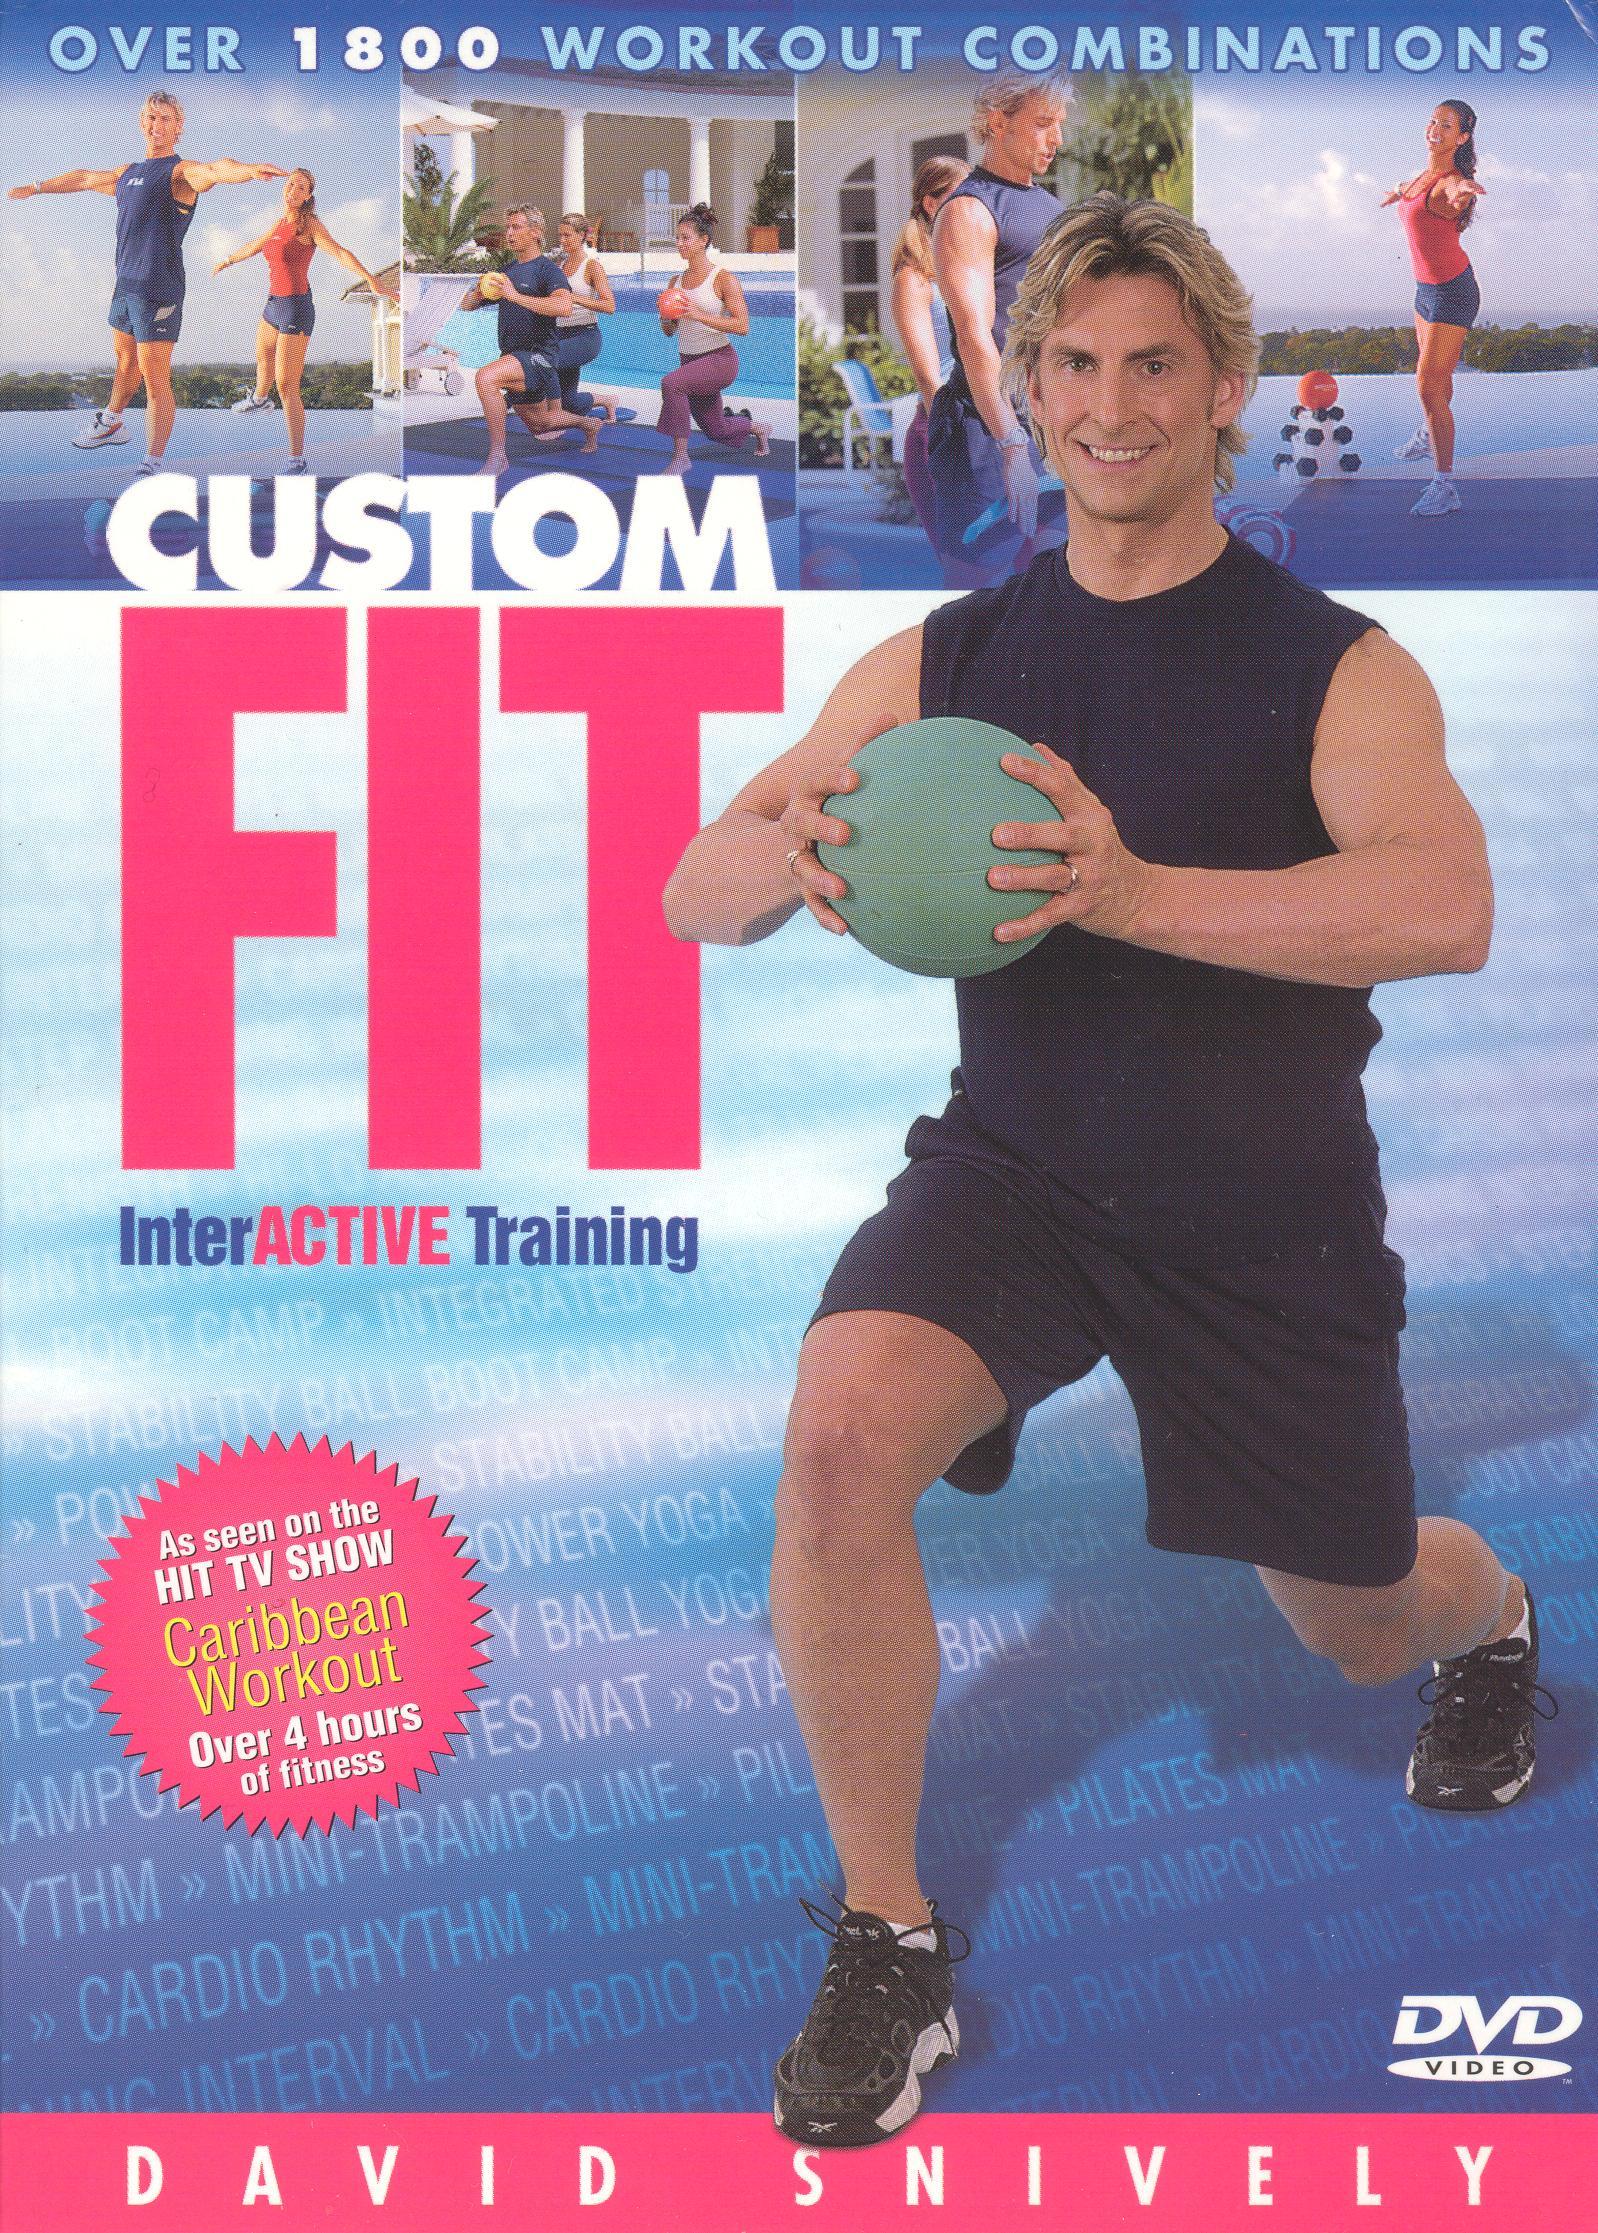 Custom Fit: InterActive Training